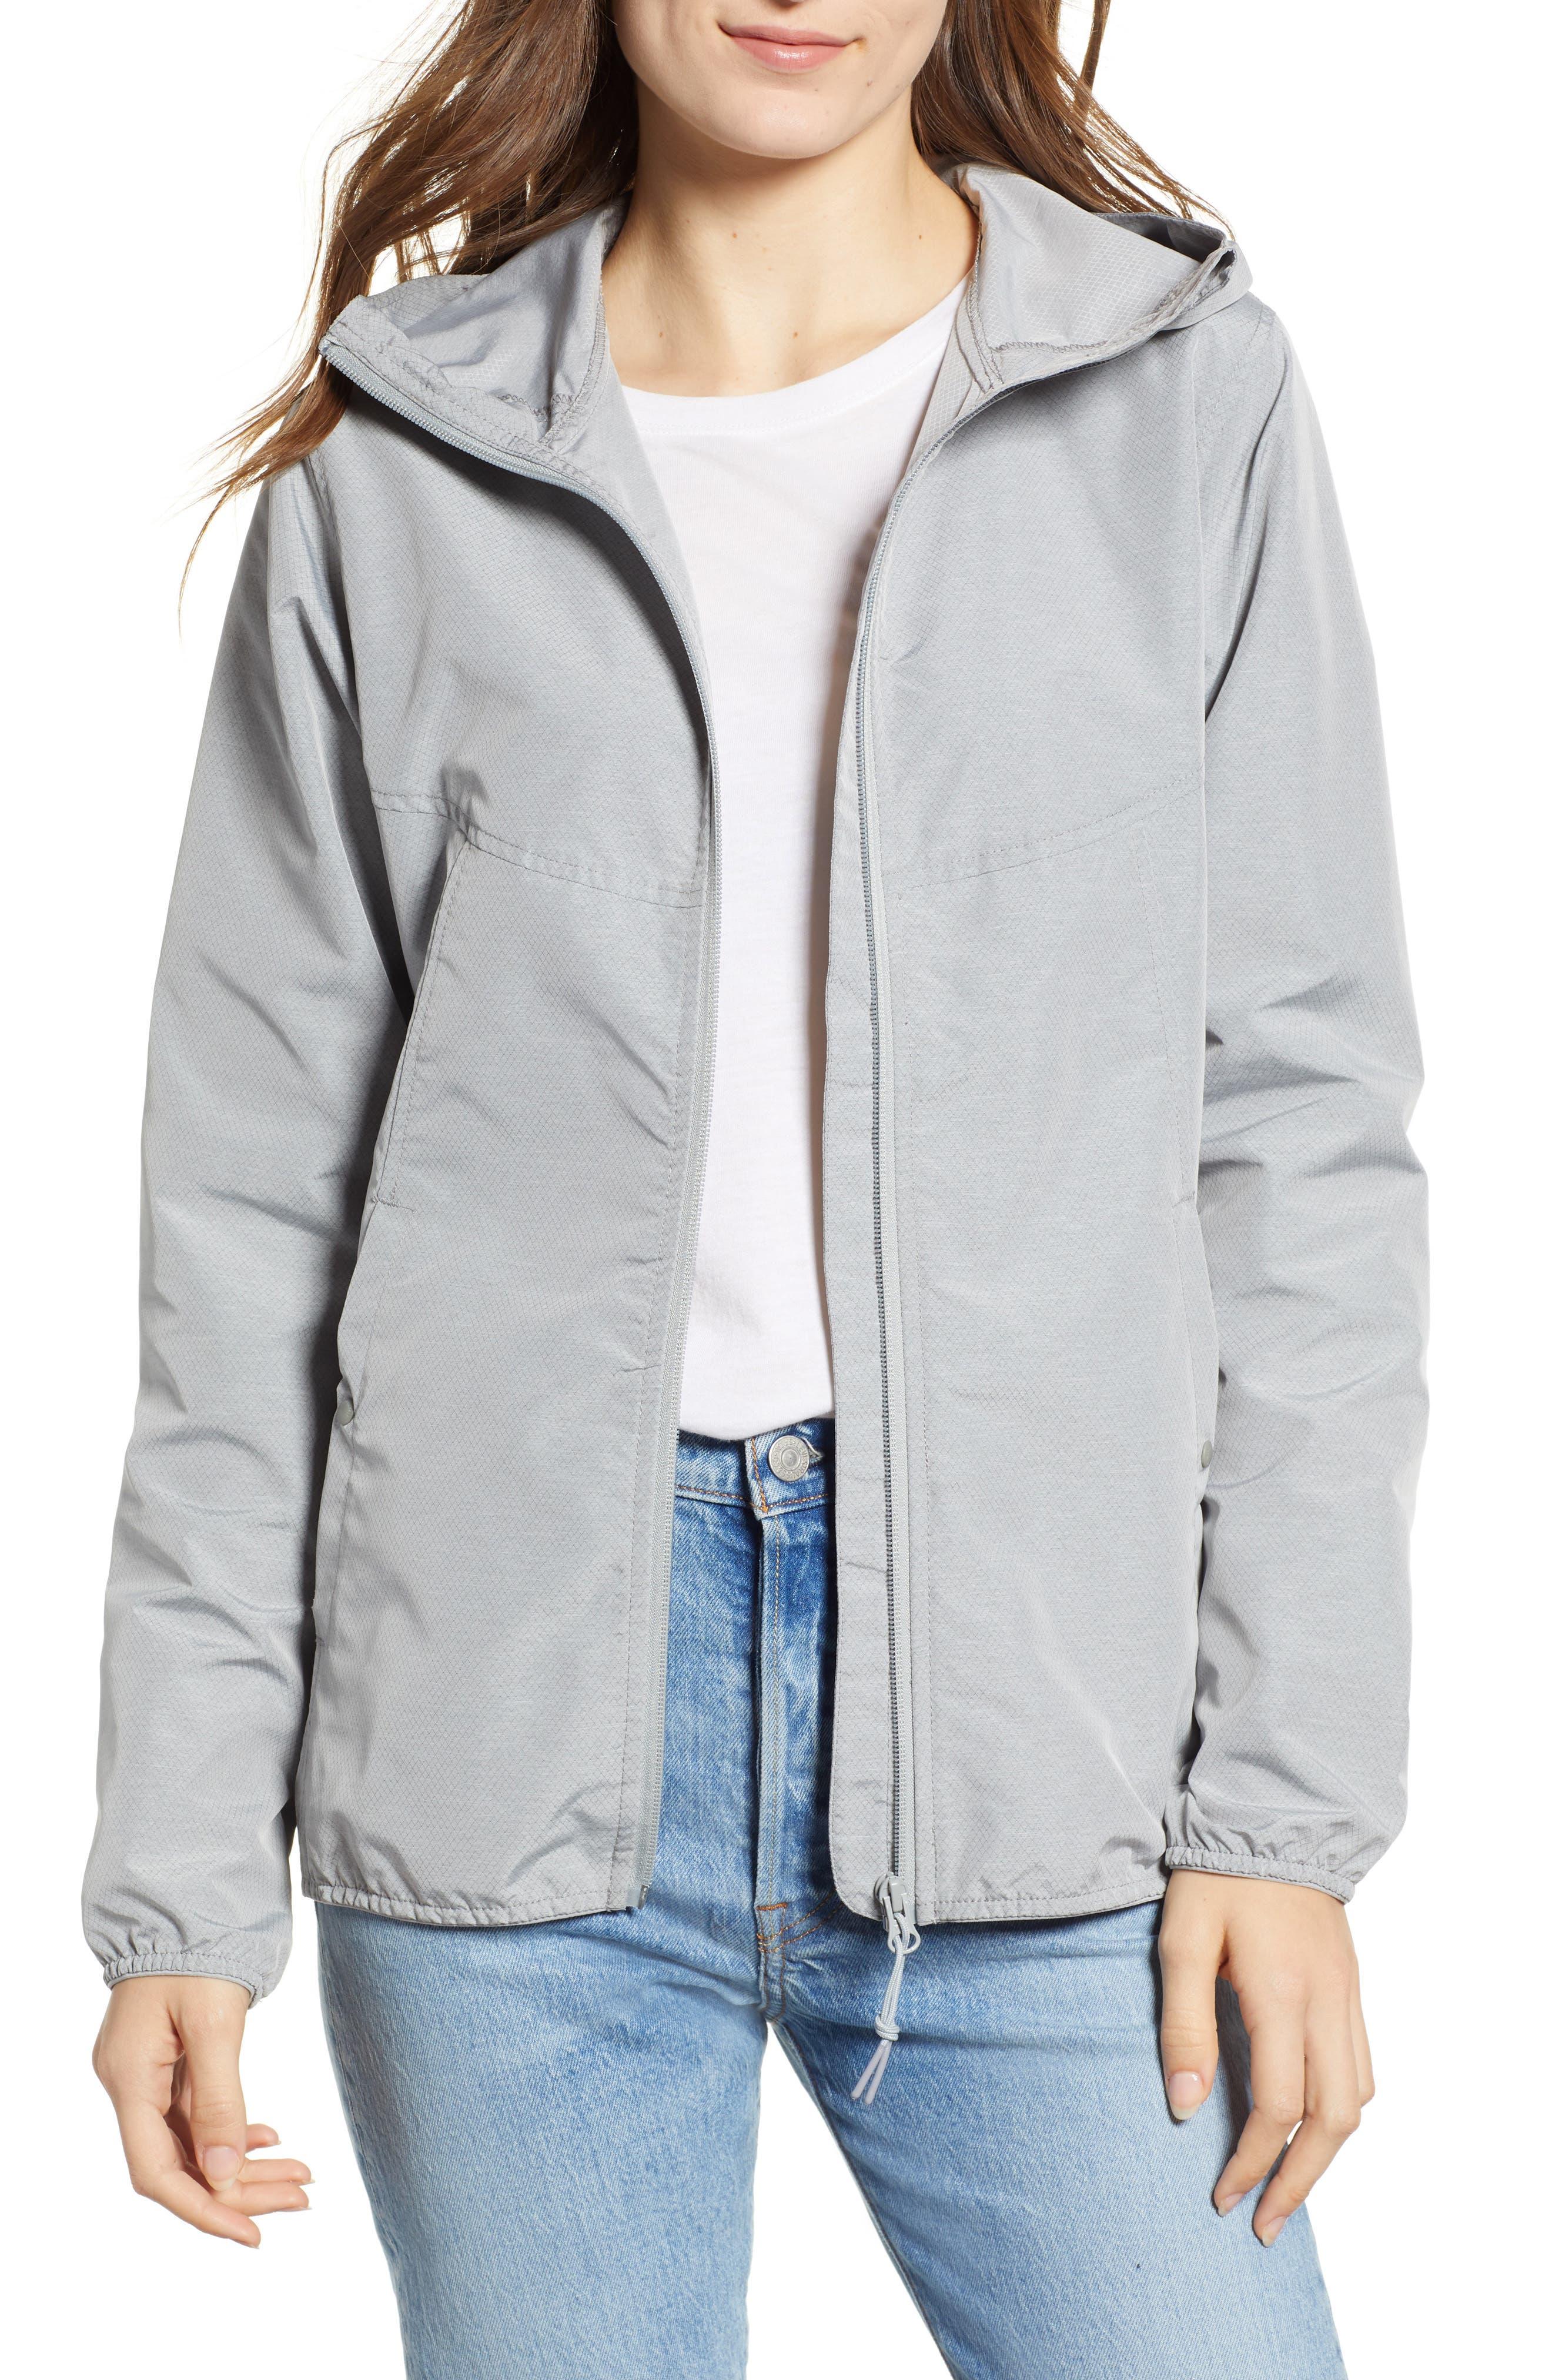 oyage Wind Hooded Jacket,                         Main,                         color, LIGHT GREY CROSSHATCH